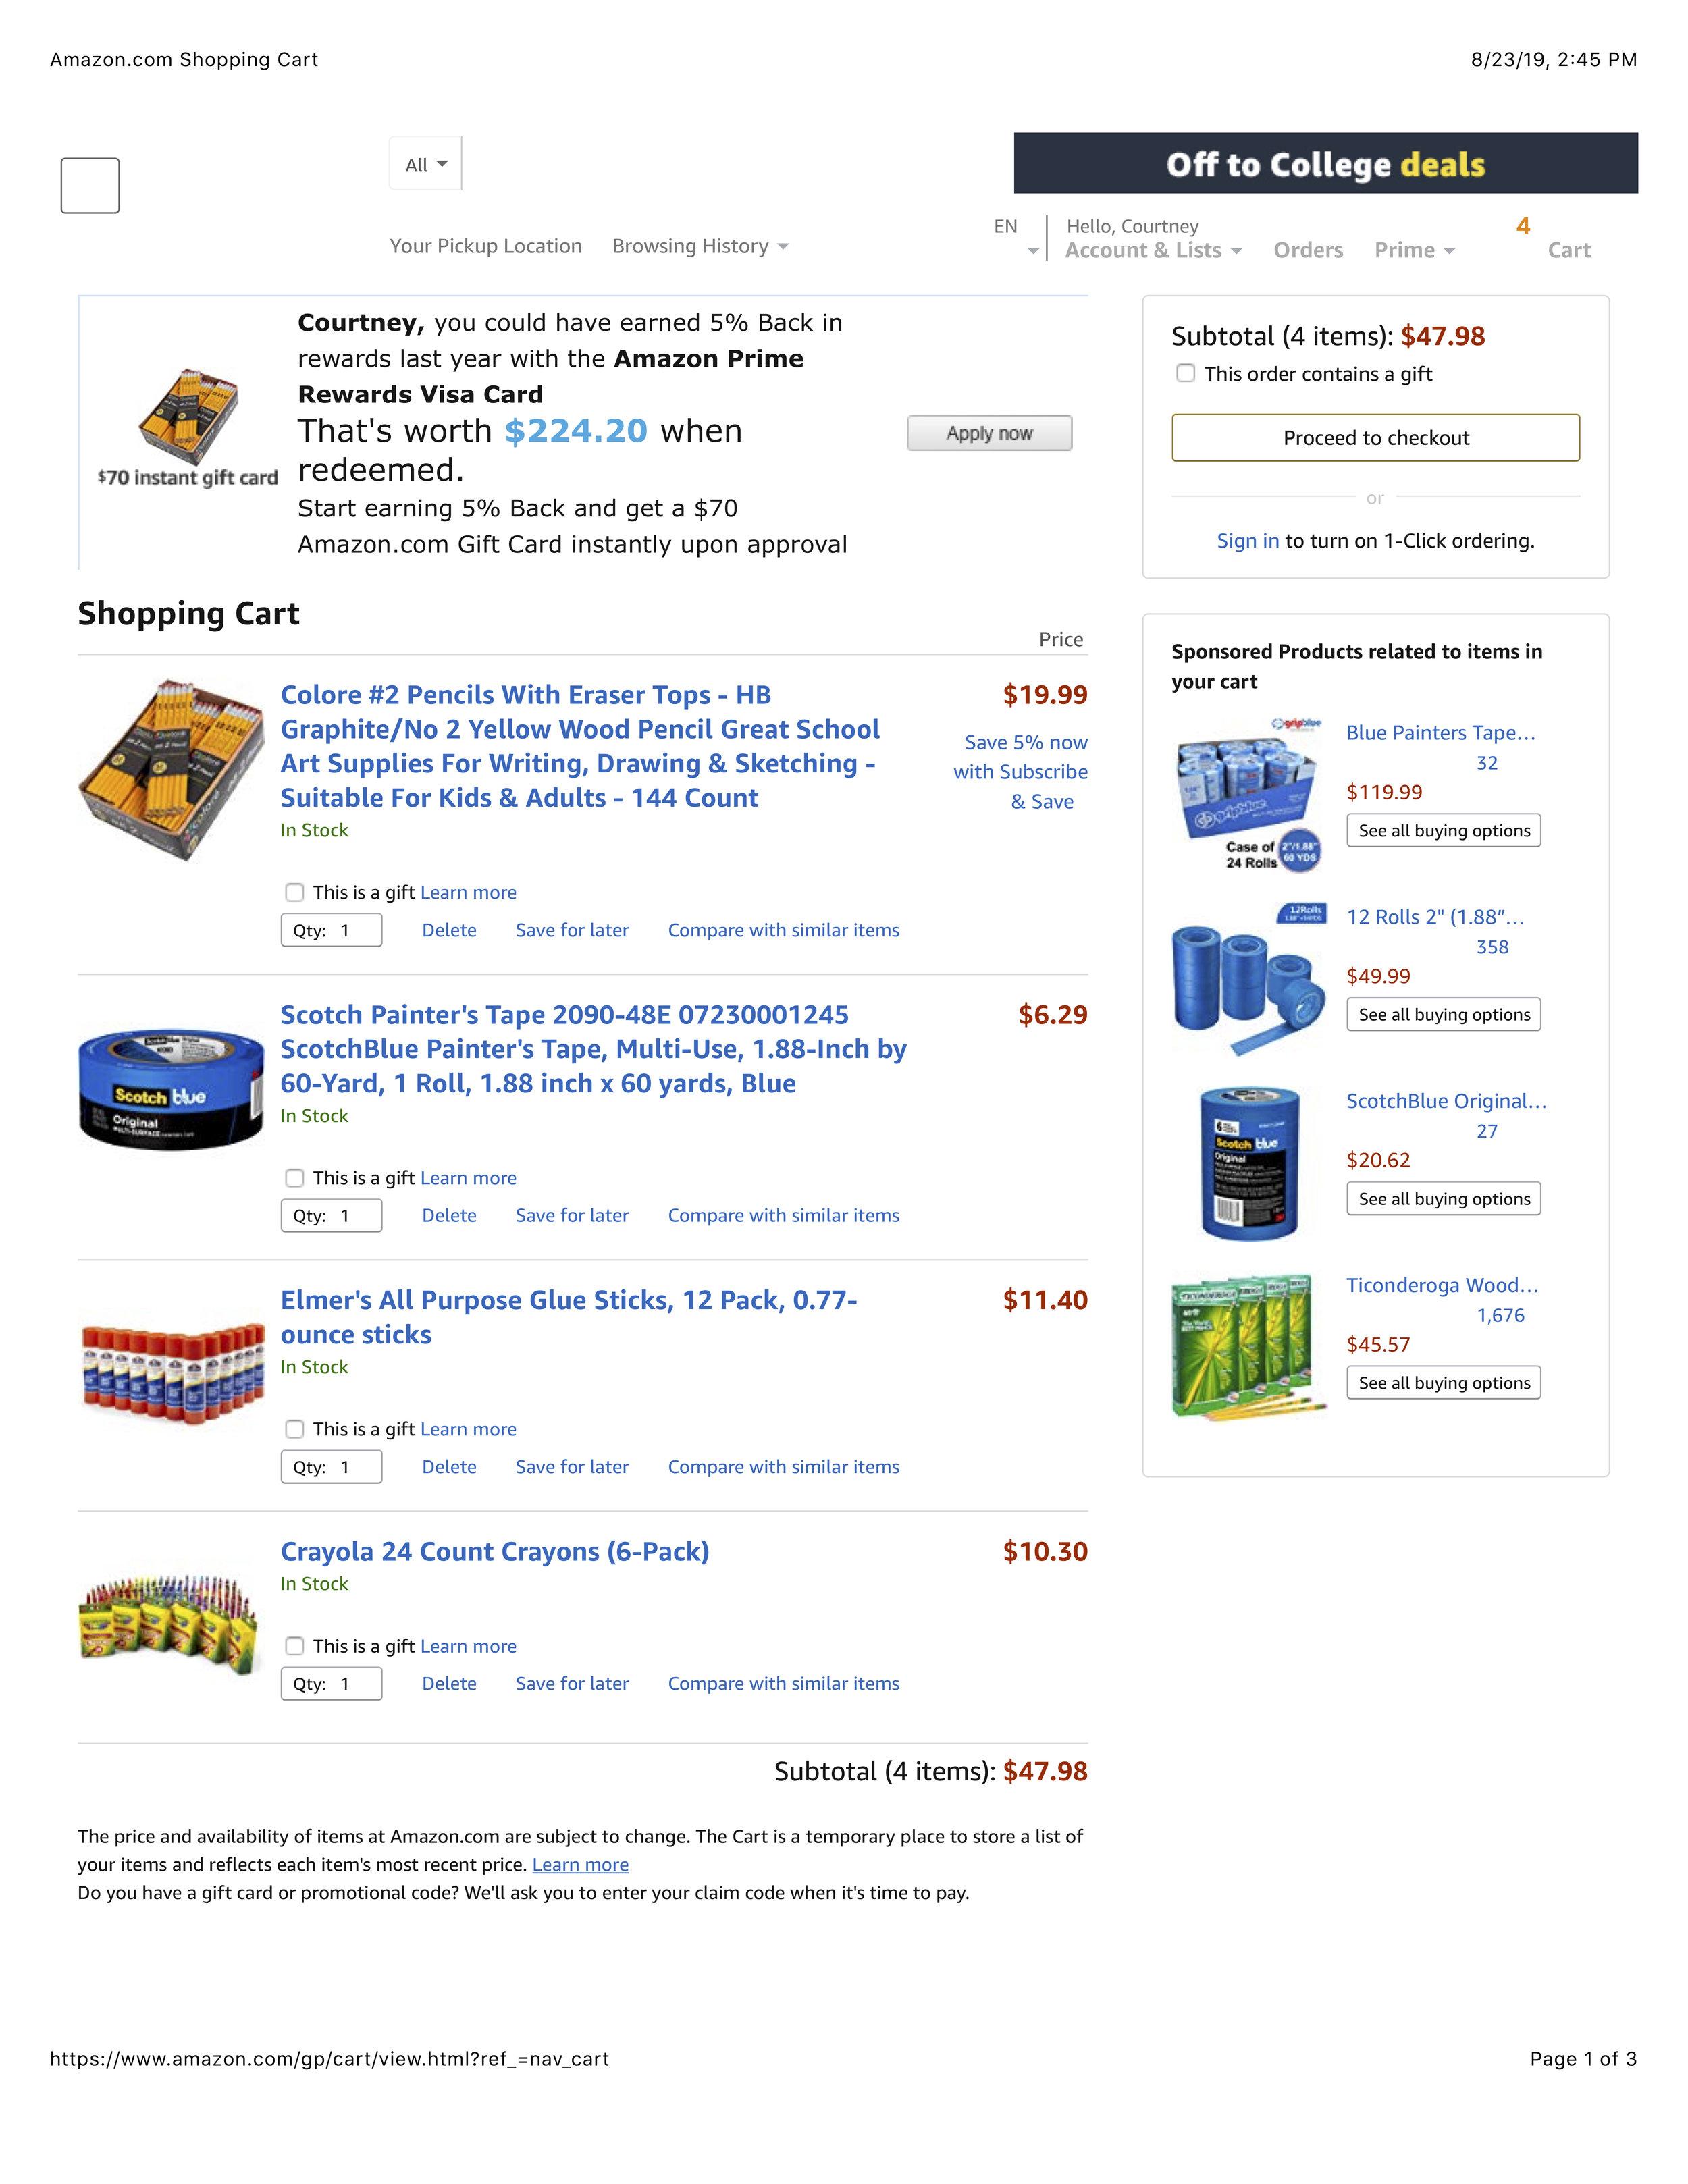 Amazon.com Shopping Cart.jpg